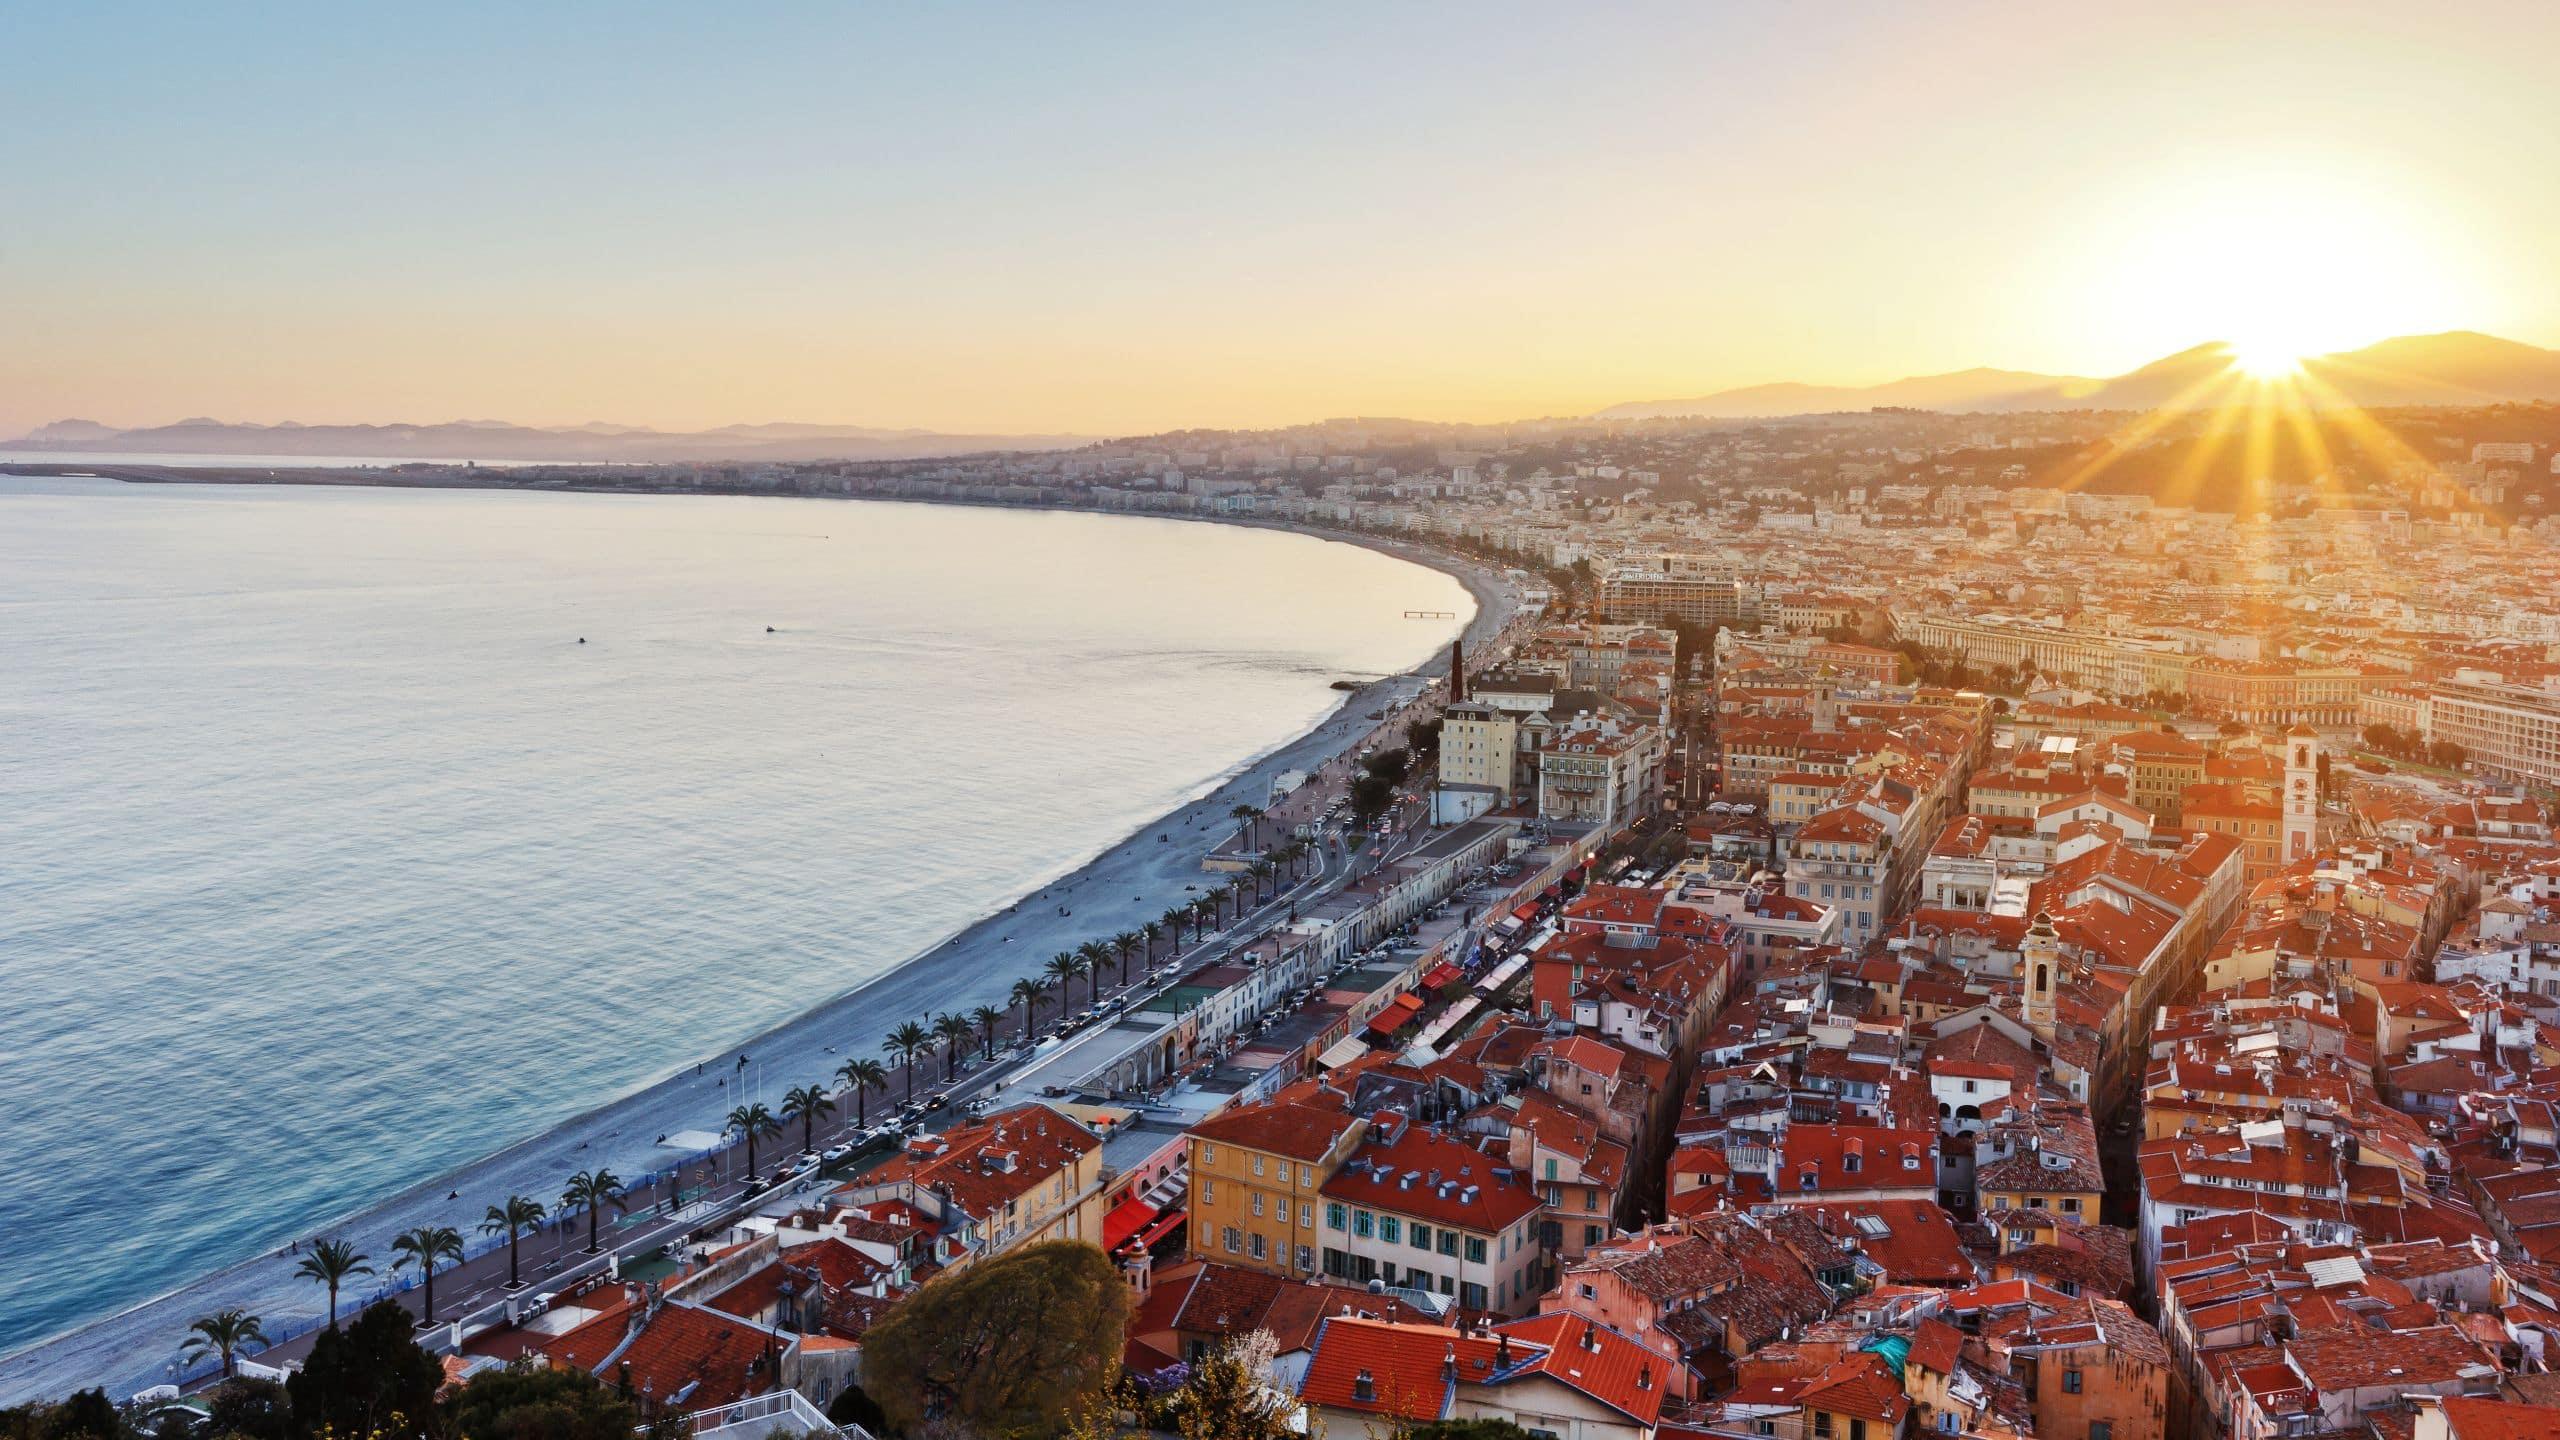 French Riviera Luxury 5 Star Hotel Hyatt Regency Nice Palais De La Mediterranee